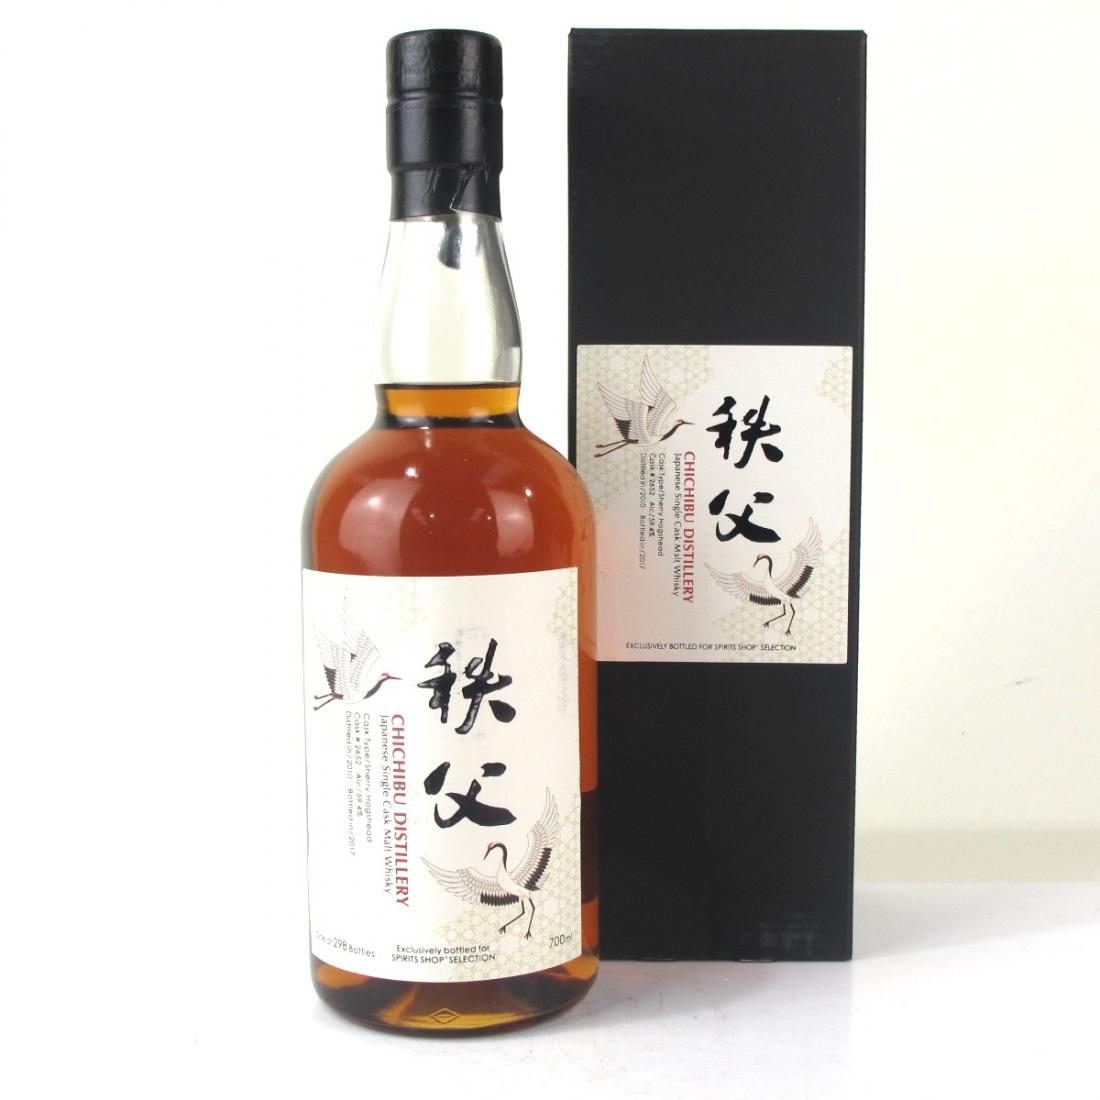 Chichibu 2010 Ichiro's Malt Single Cask #2652 / Spirits Shop' Selection